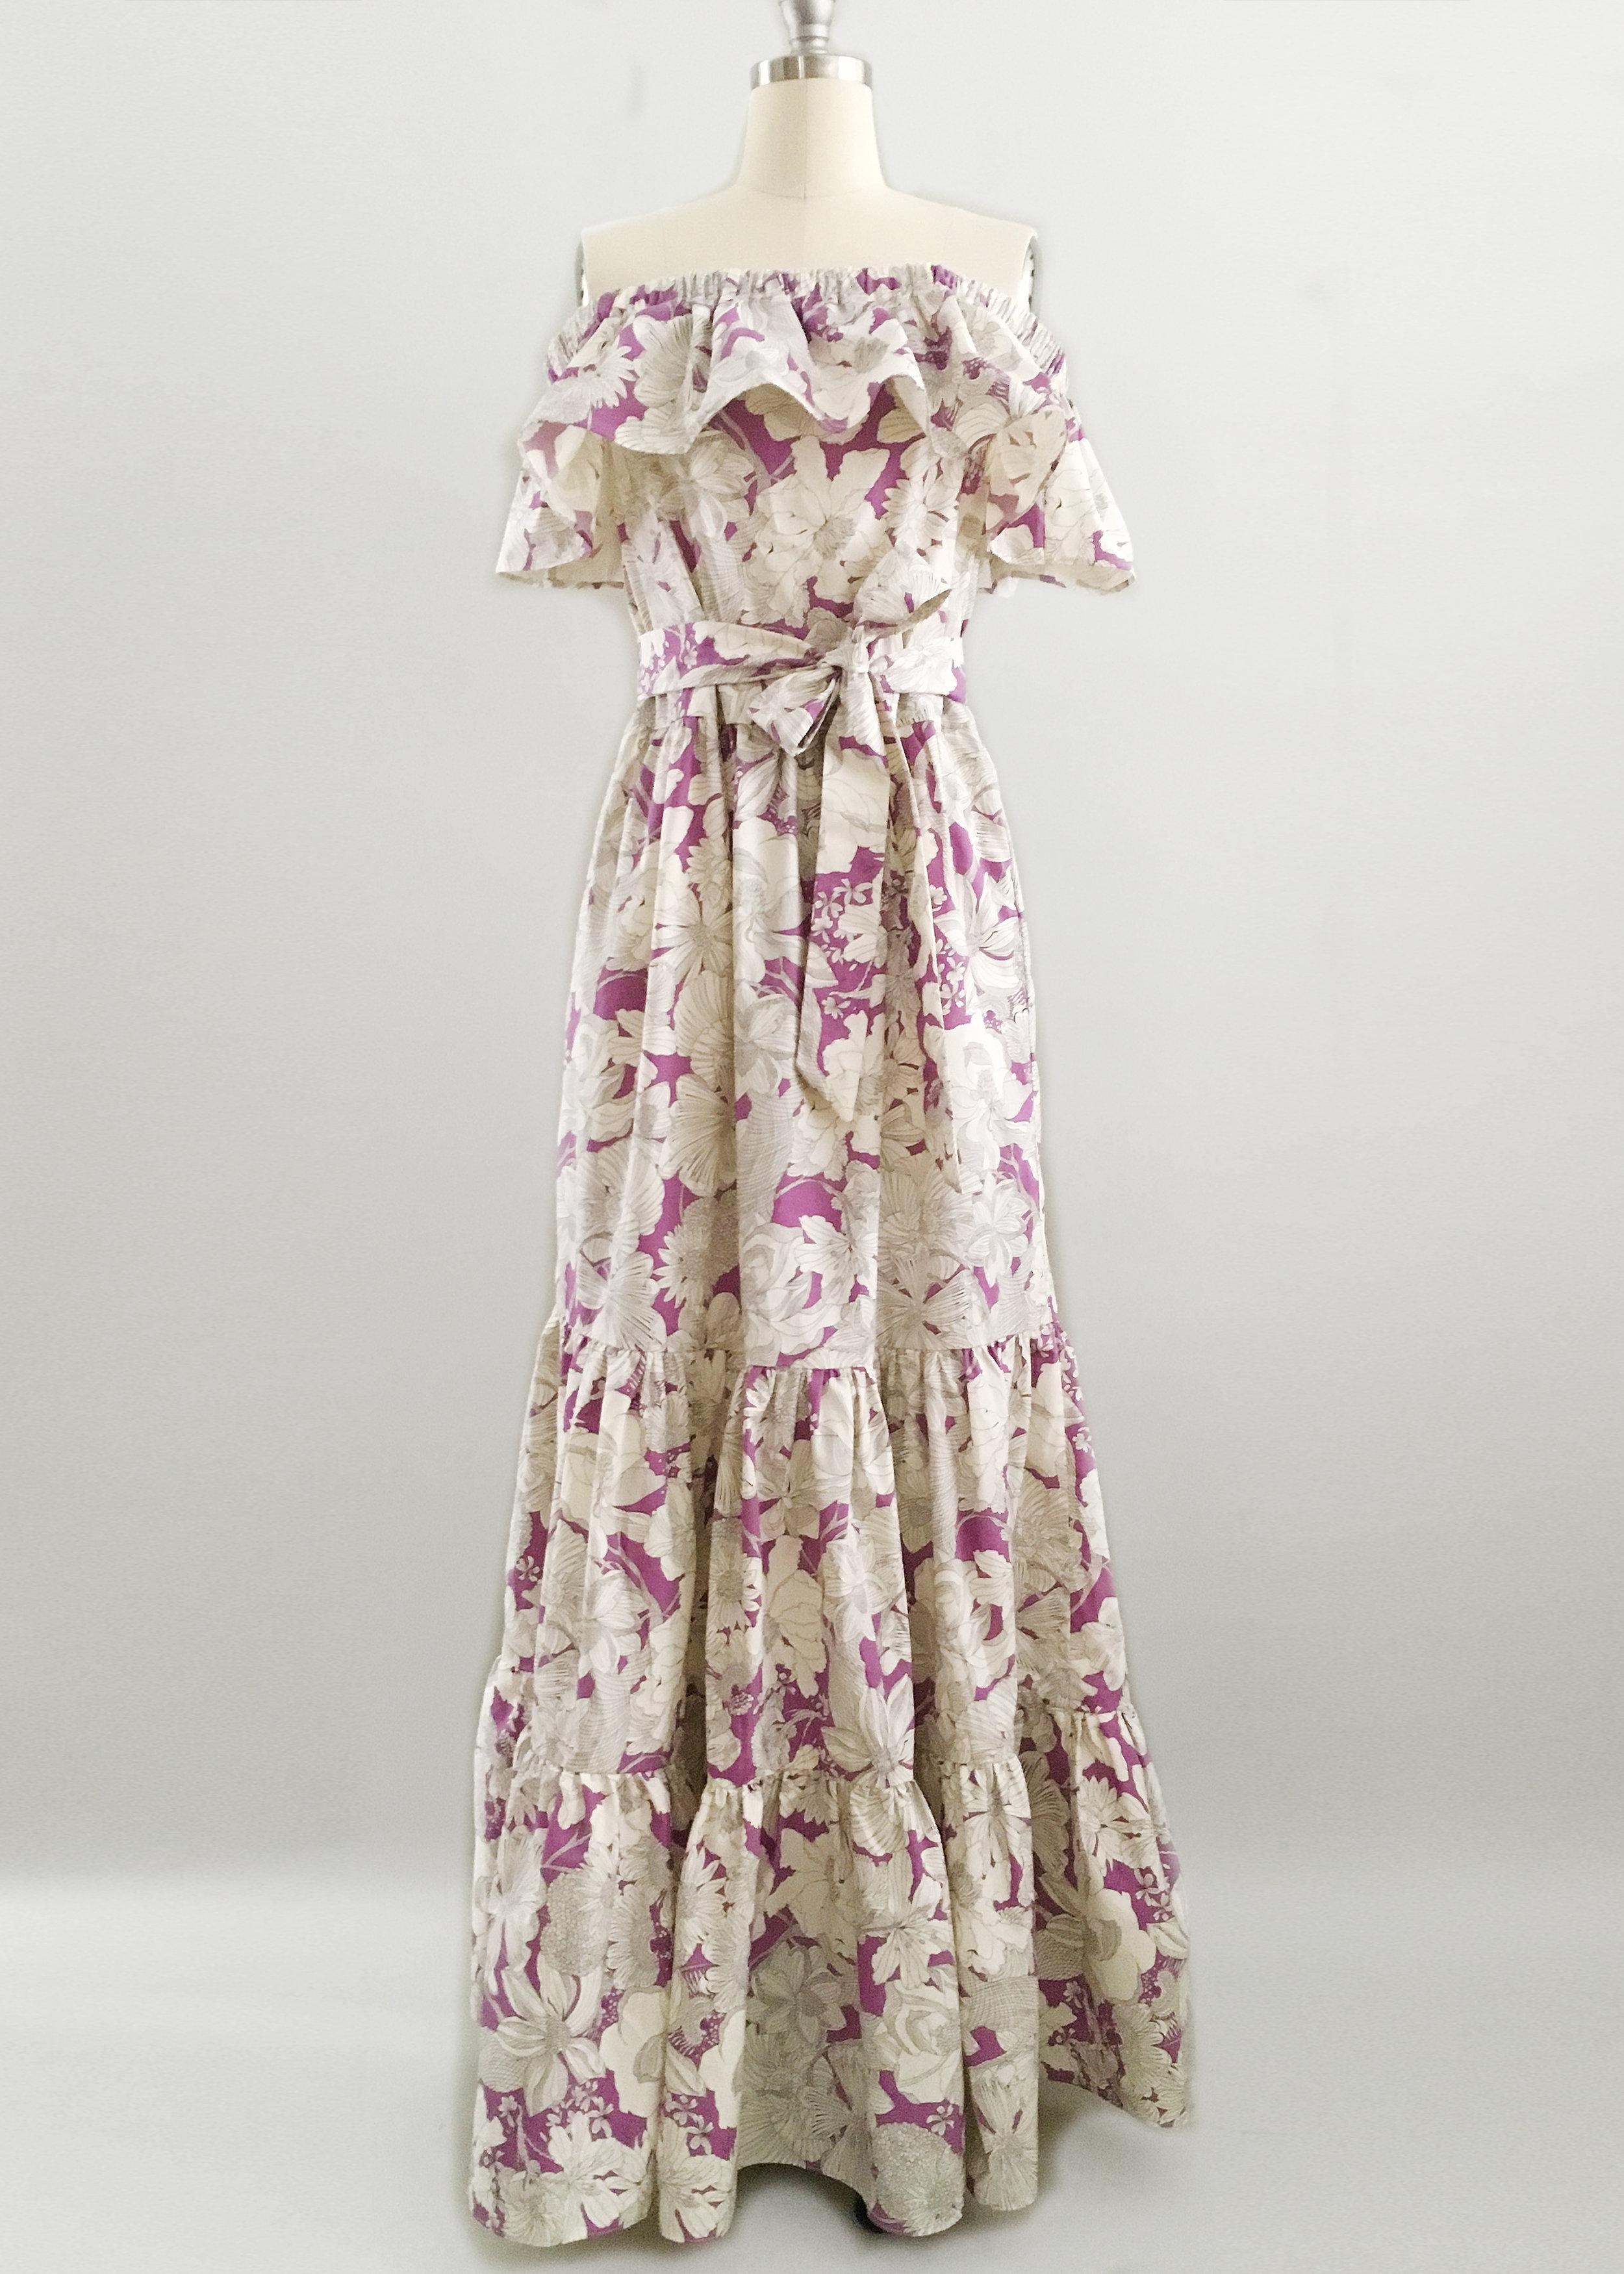 Liberty Print Cotton Floral Custom Tiered Maxi Dress.jpg